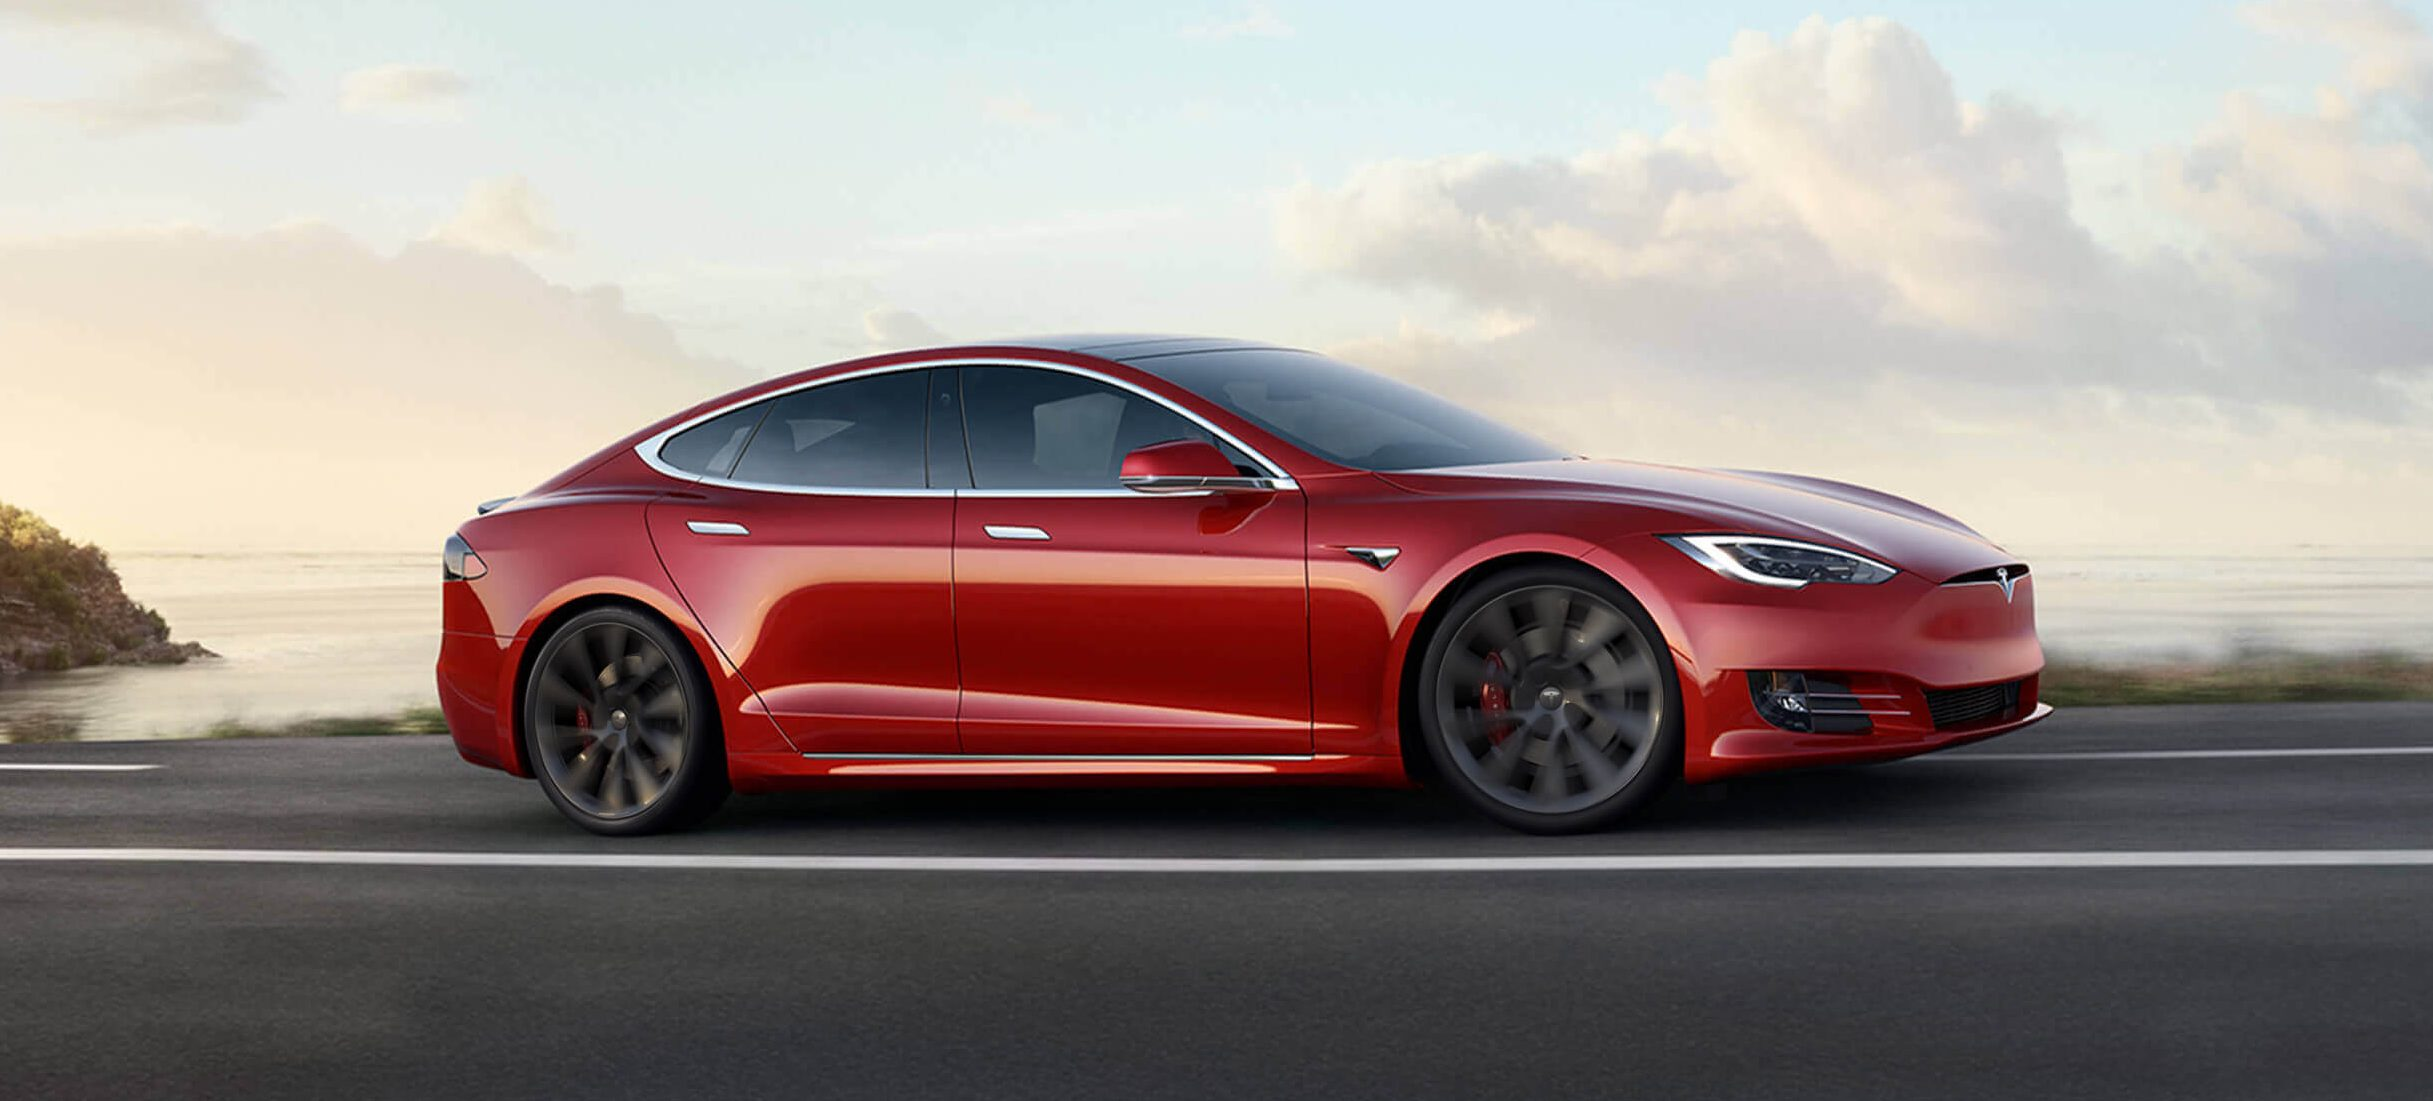 Tesla Model S Performance red hero e1587646288988 jpg?quality=82&strip=all.'